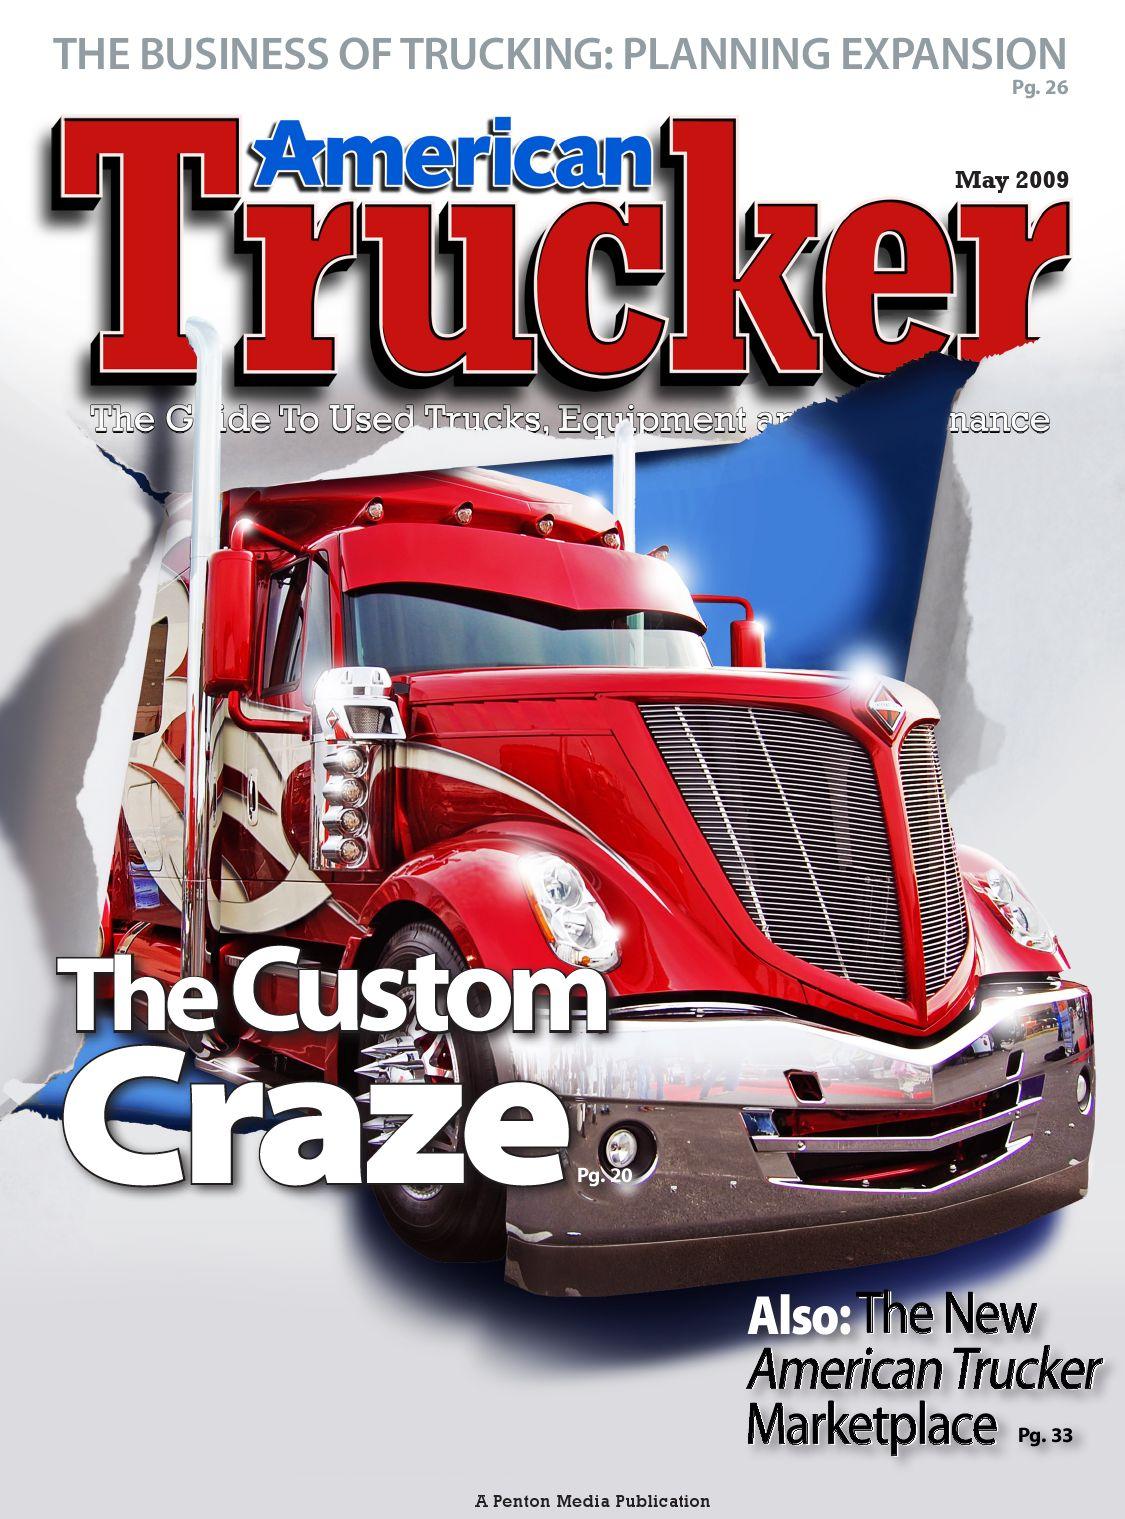 American Trucker May East Edition by American Trucker - issuu